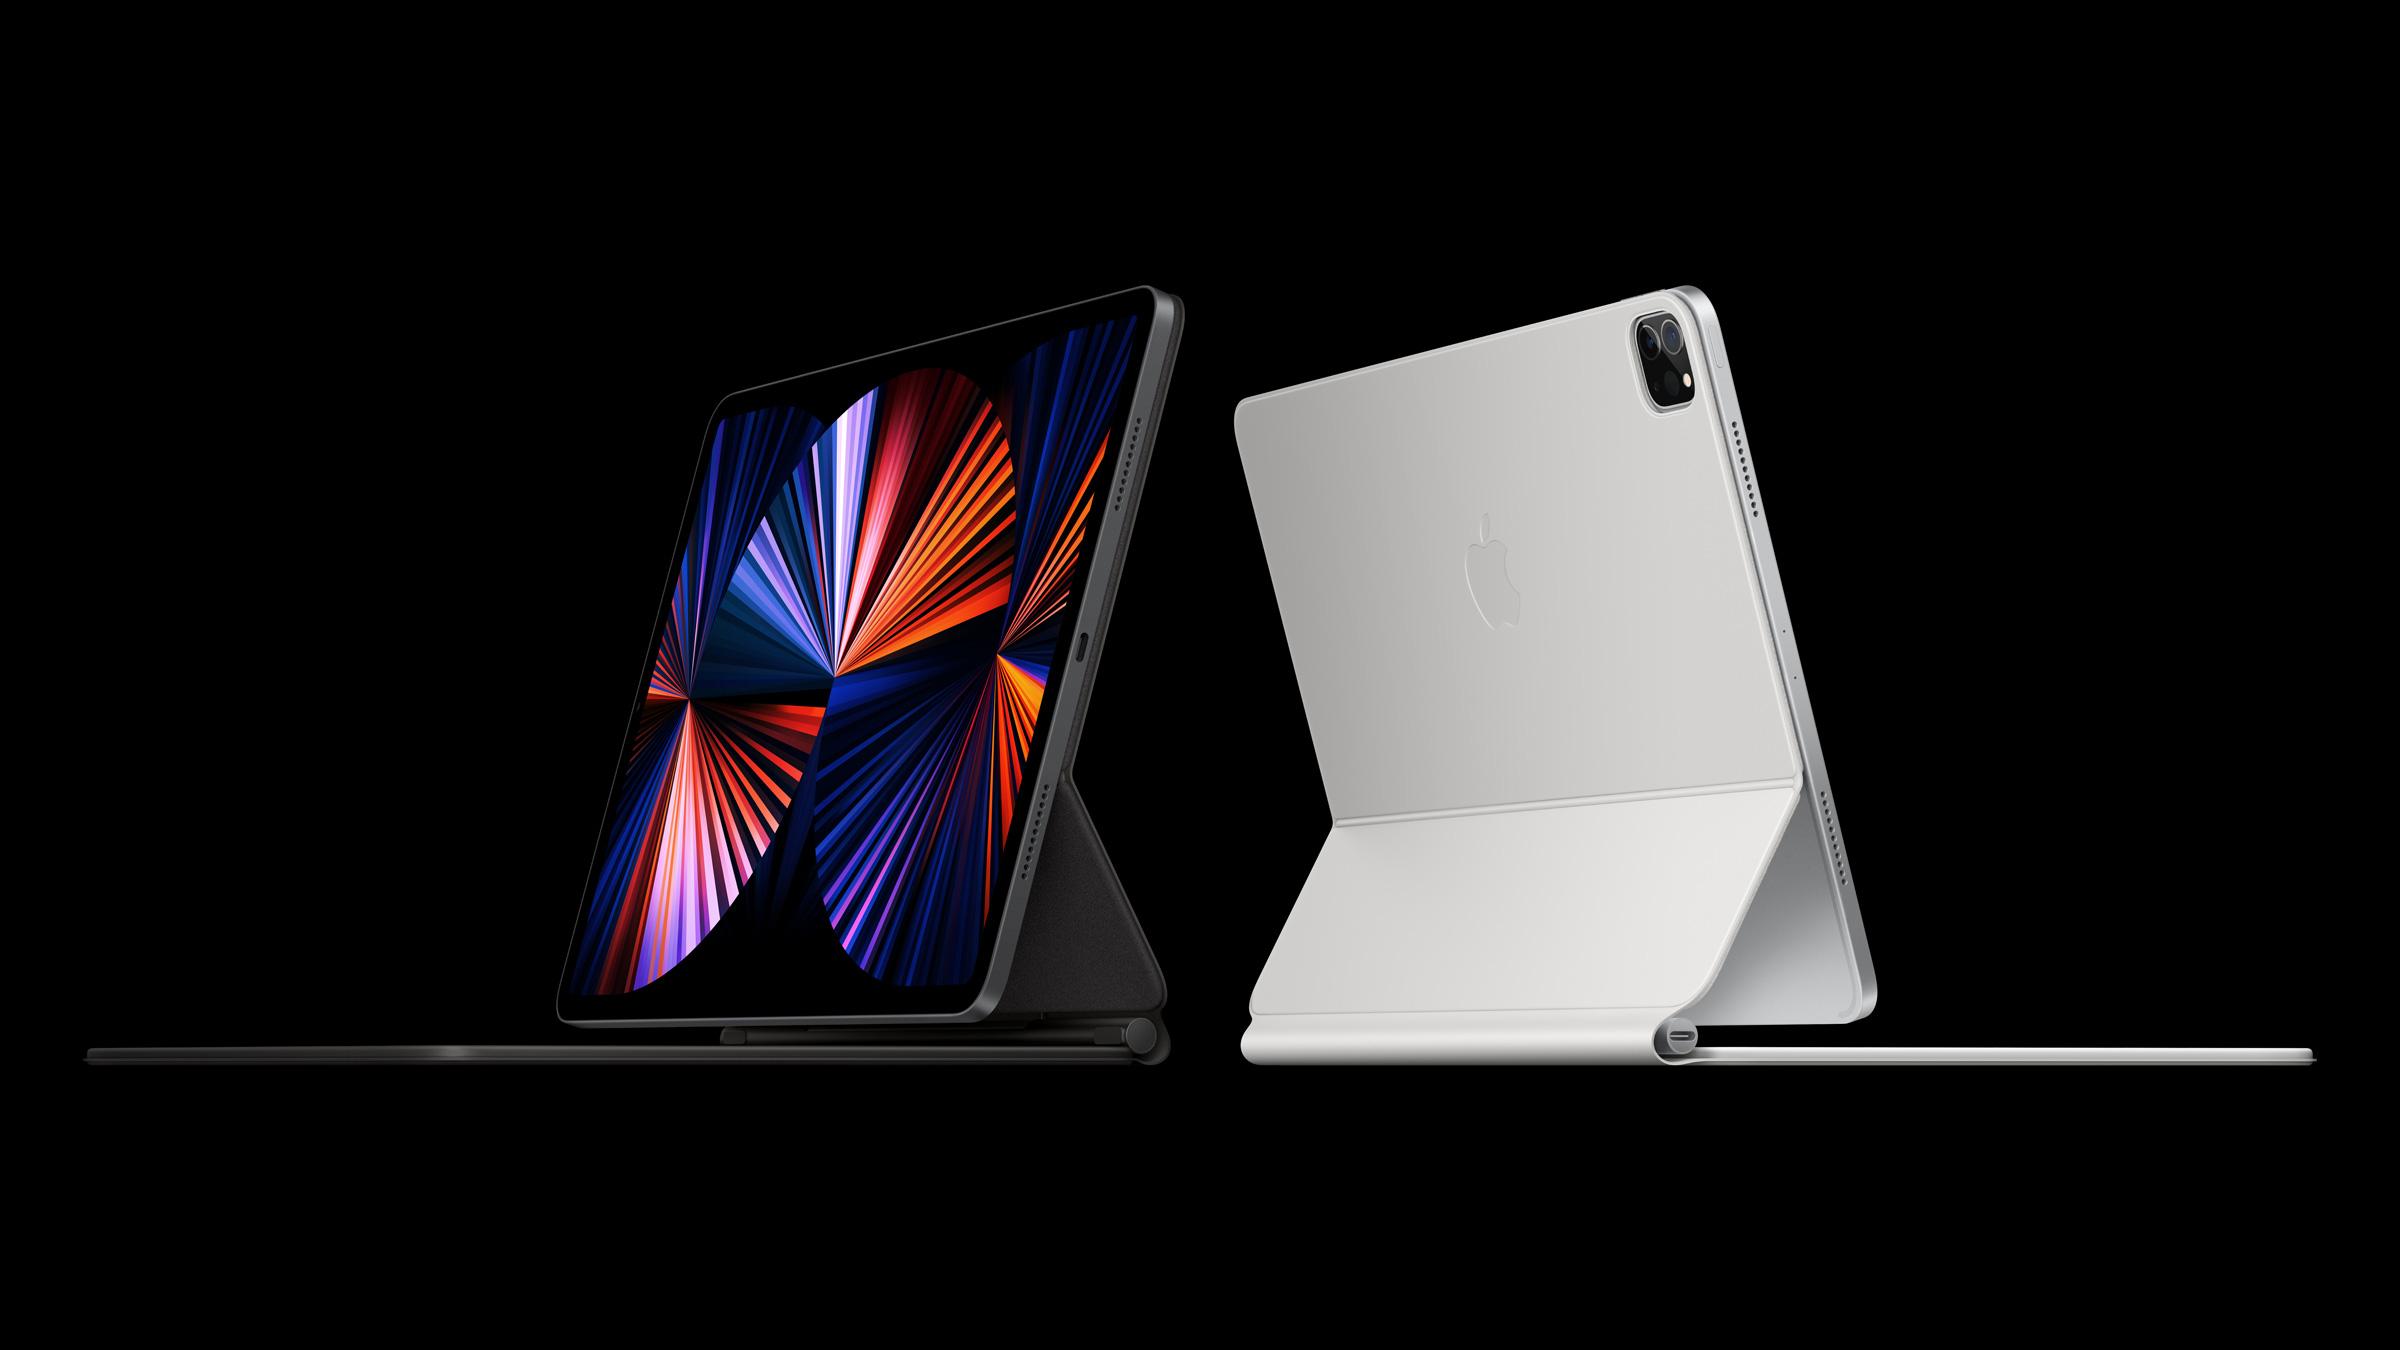 iPad Pro 2021 : la puce des Mac et un écran mini LED ultra contrasté